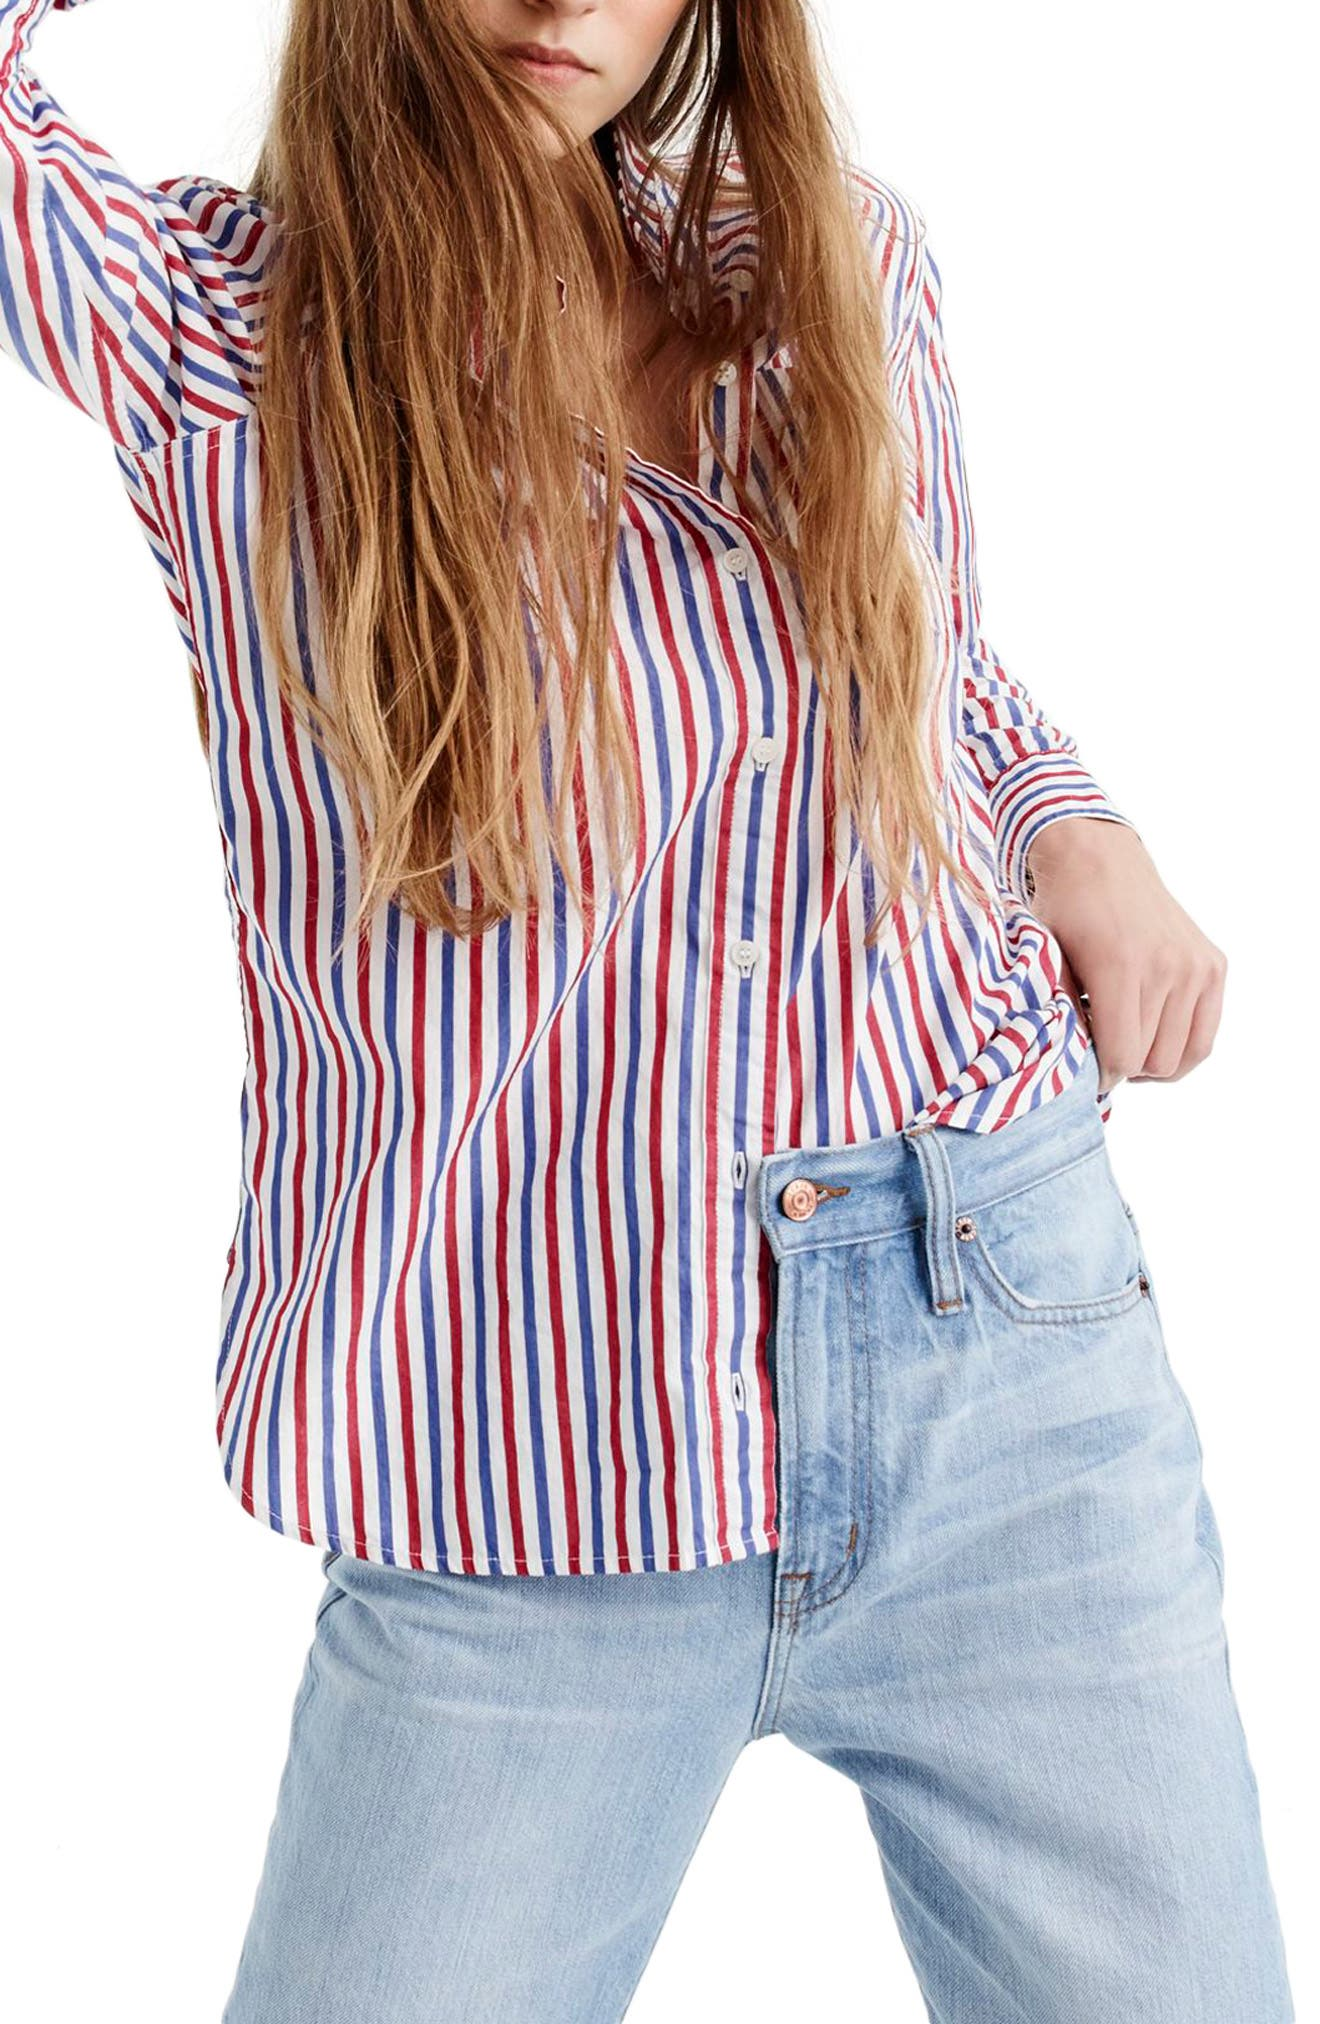 J. Crew Stripe Boyfriend Shirt,                         Main,                         color, 600